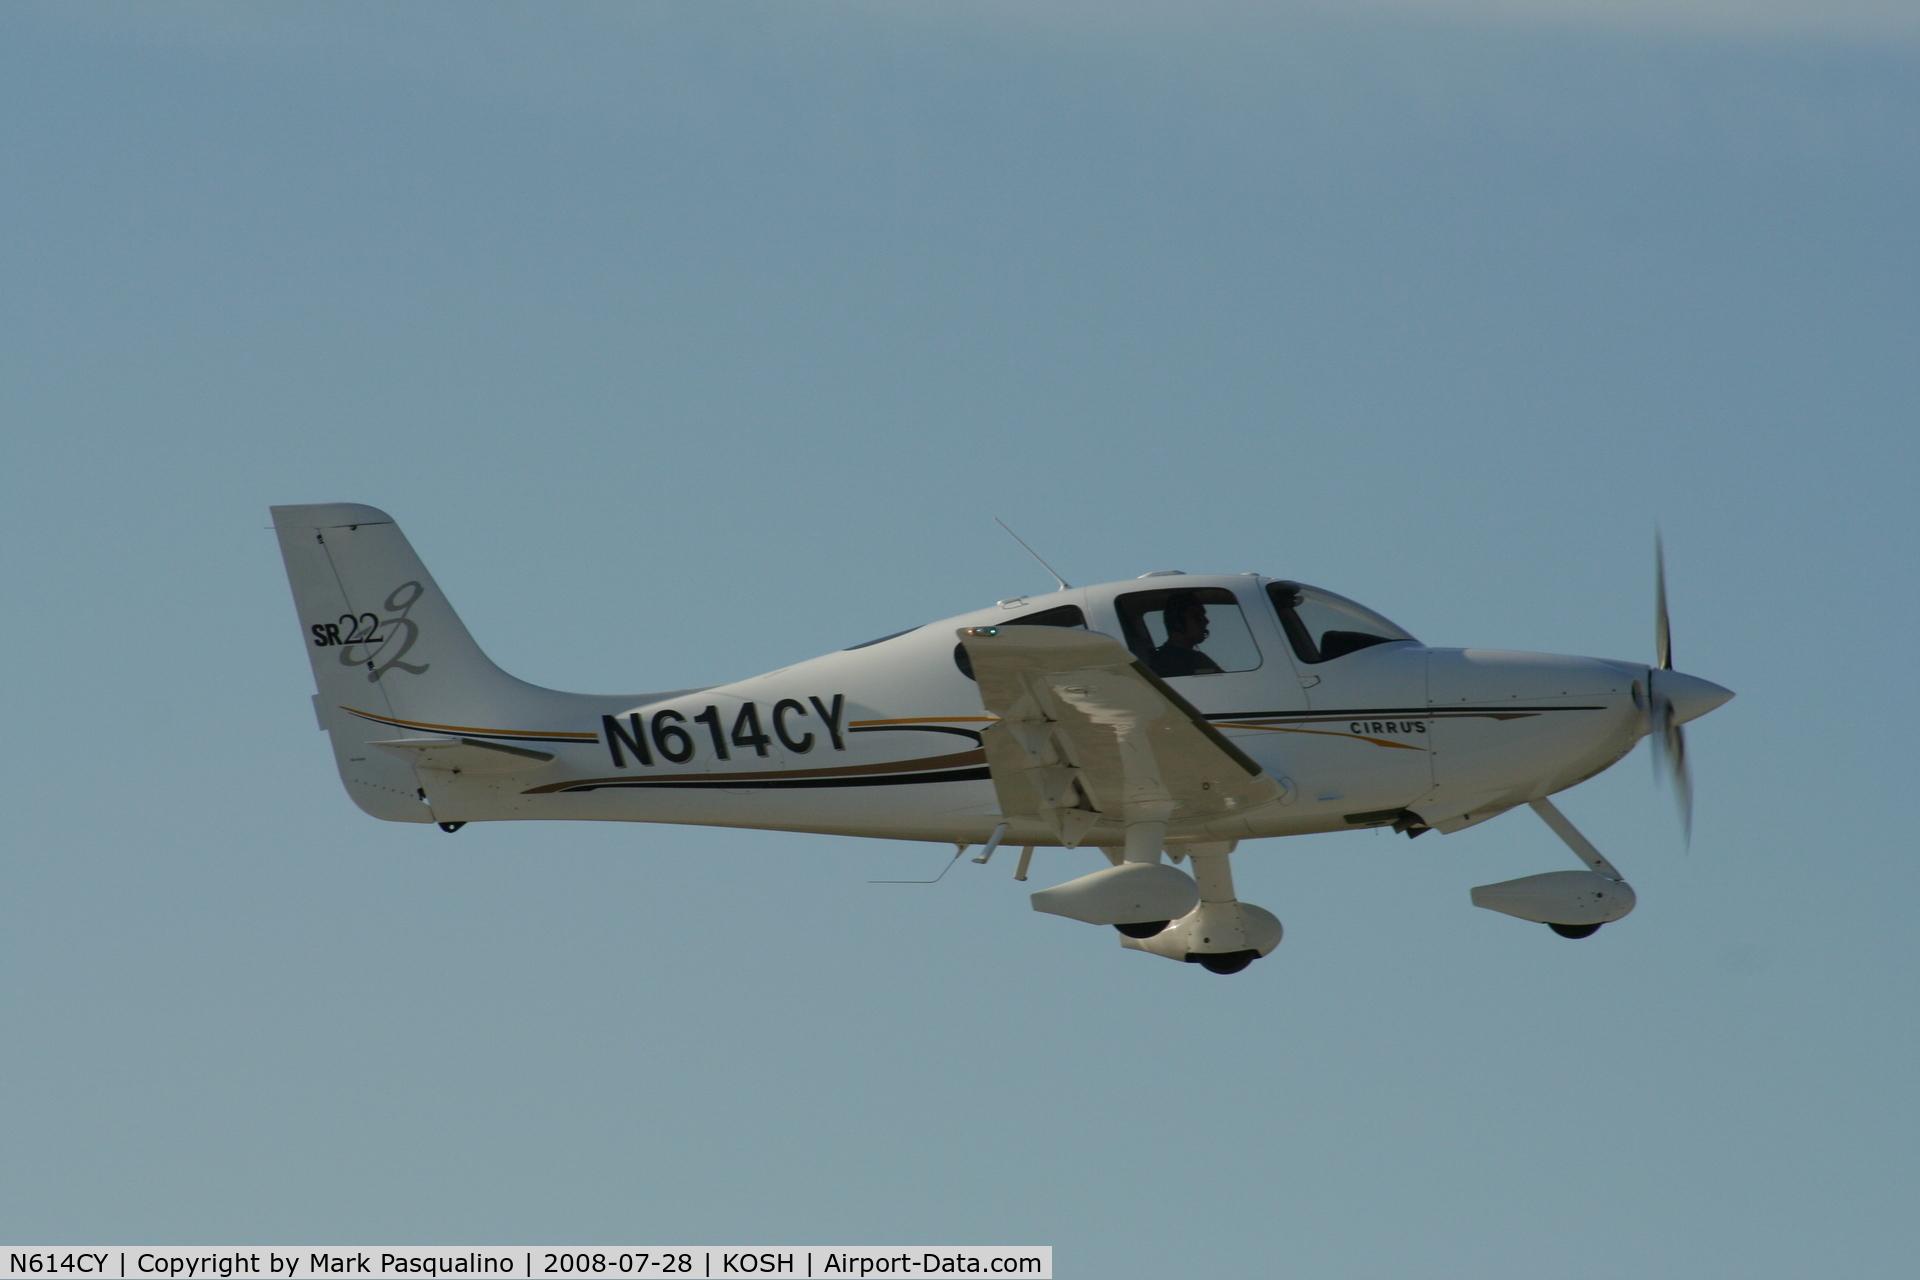 N614CY, 2004 Cirrus SR22 G2 C/N 1050, Cirrus SR22